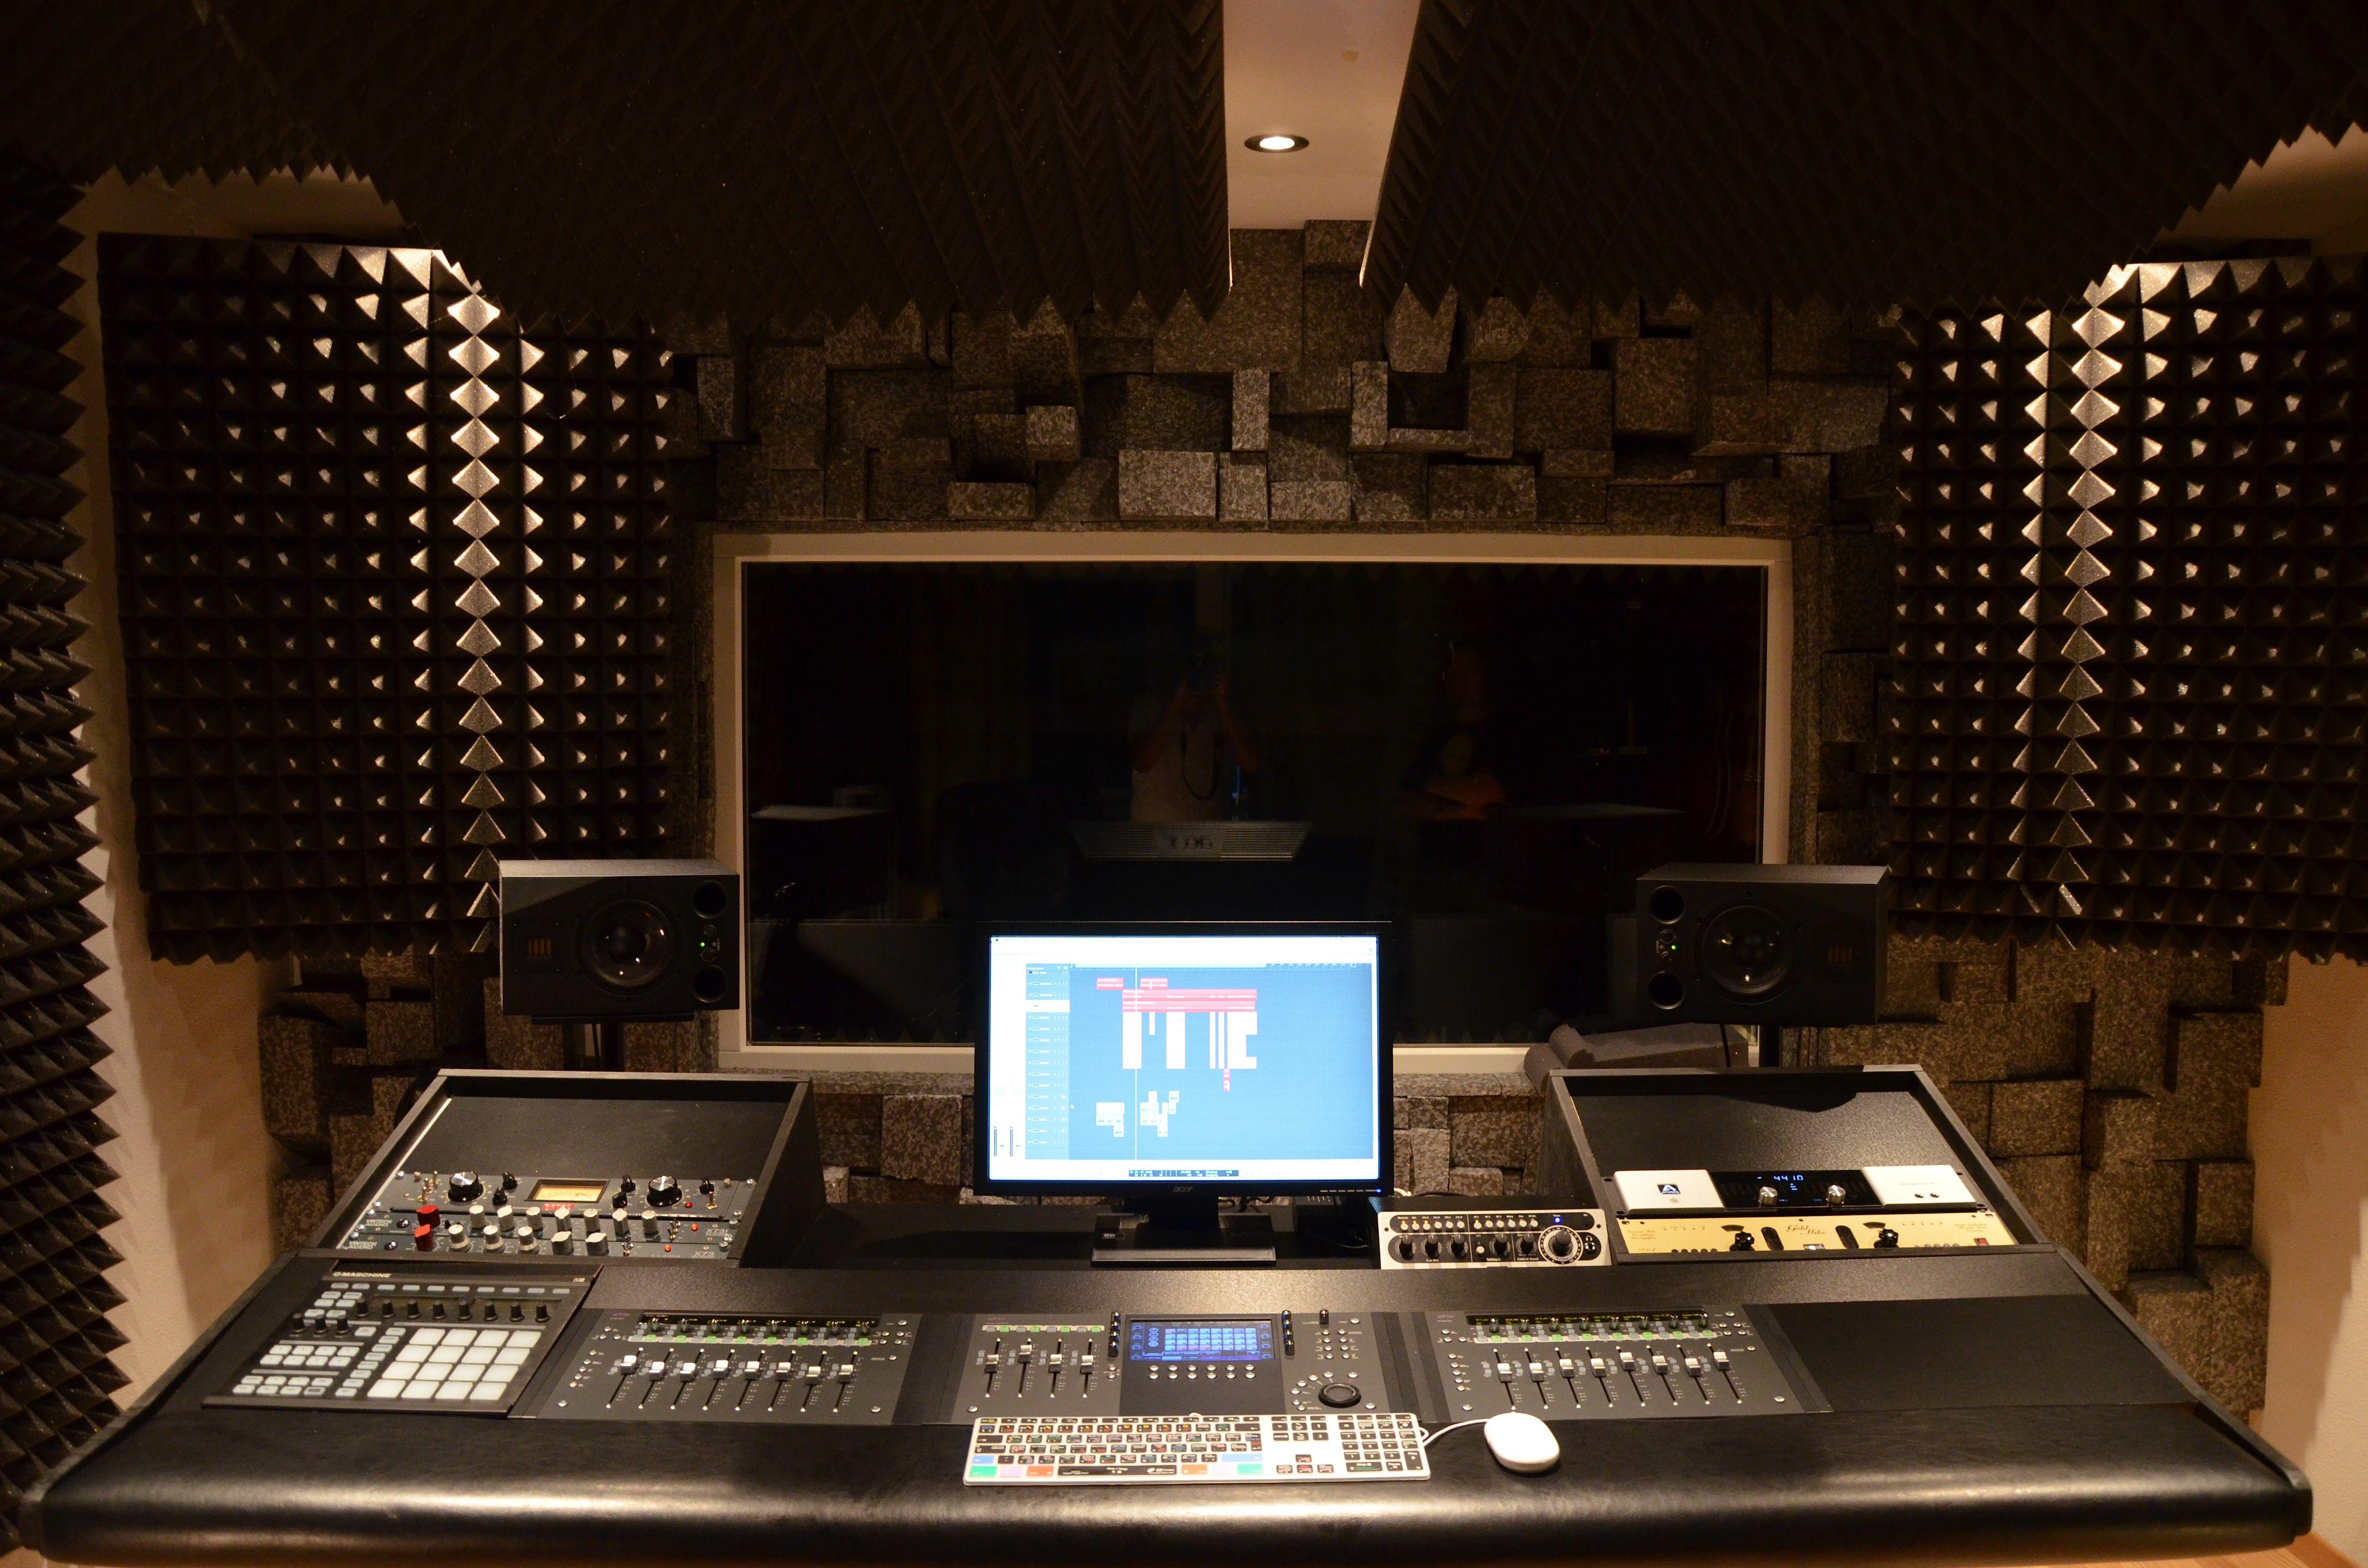 d finally building my new studio desk dsc 1168